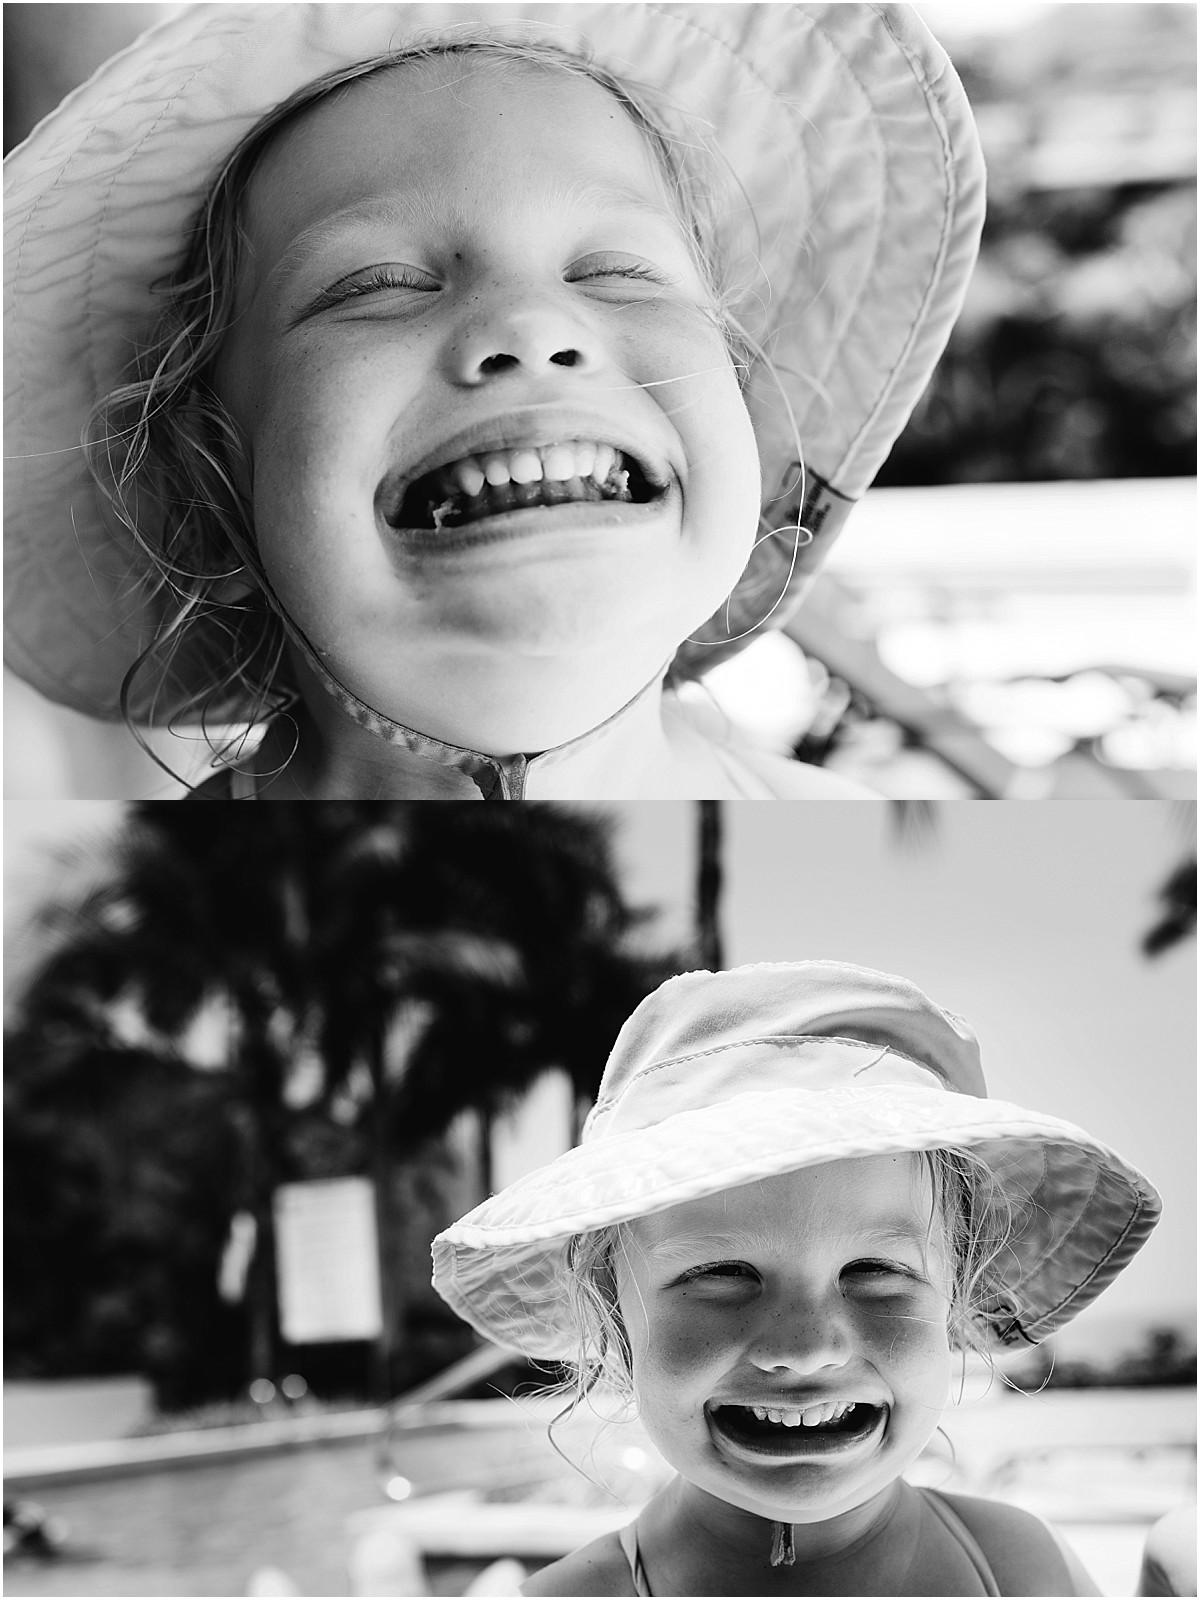 Ashley_Rogers_Photography_South_Florida_Photographer_Orlando_Photographer_Costa_Rica_Photographer_0425.jpg